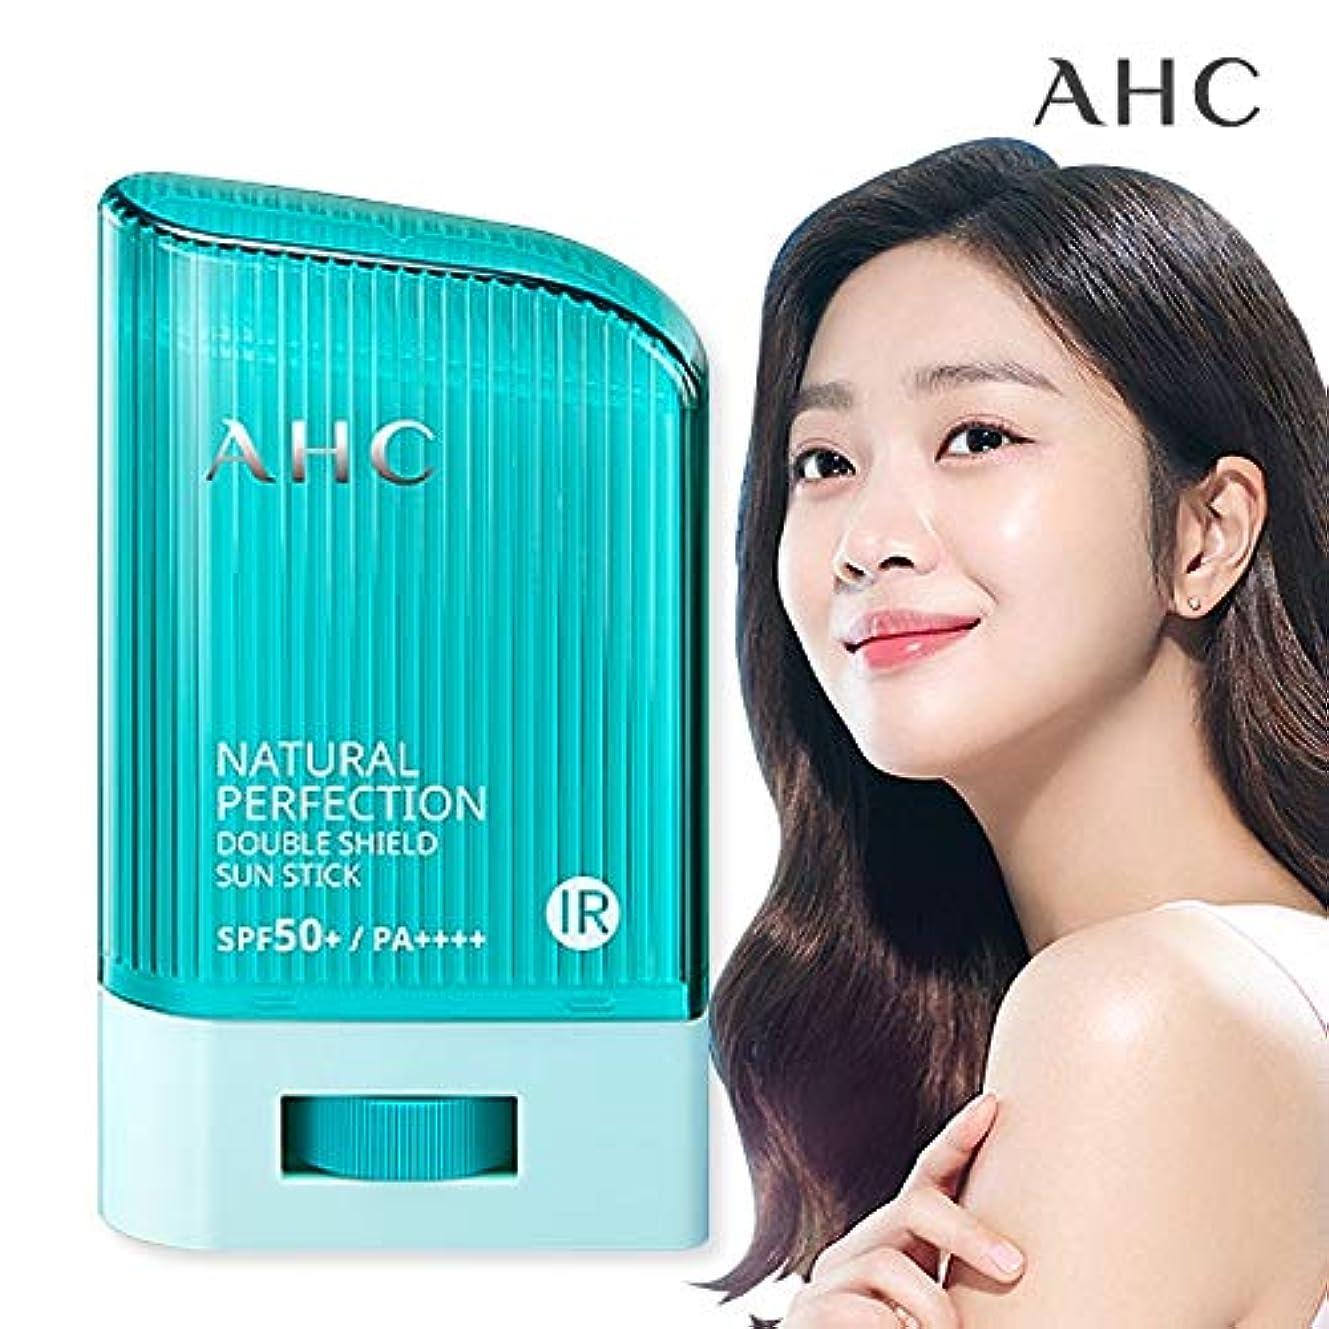 AHC ナチュラルパーフェクションダブルシールドサンスティック 22g, SPF50+ PA++++ A.H.C Natural Perfection Double Shield Sun Stick